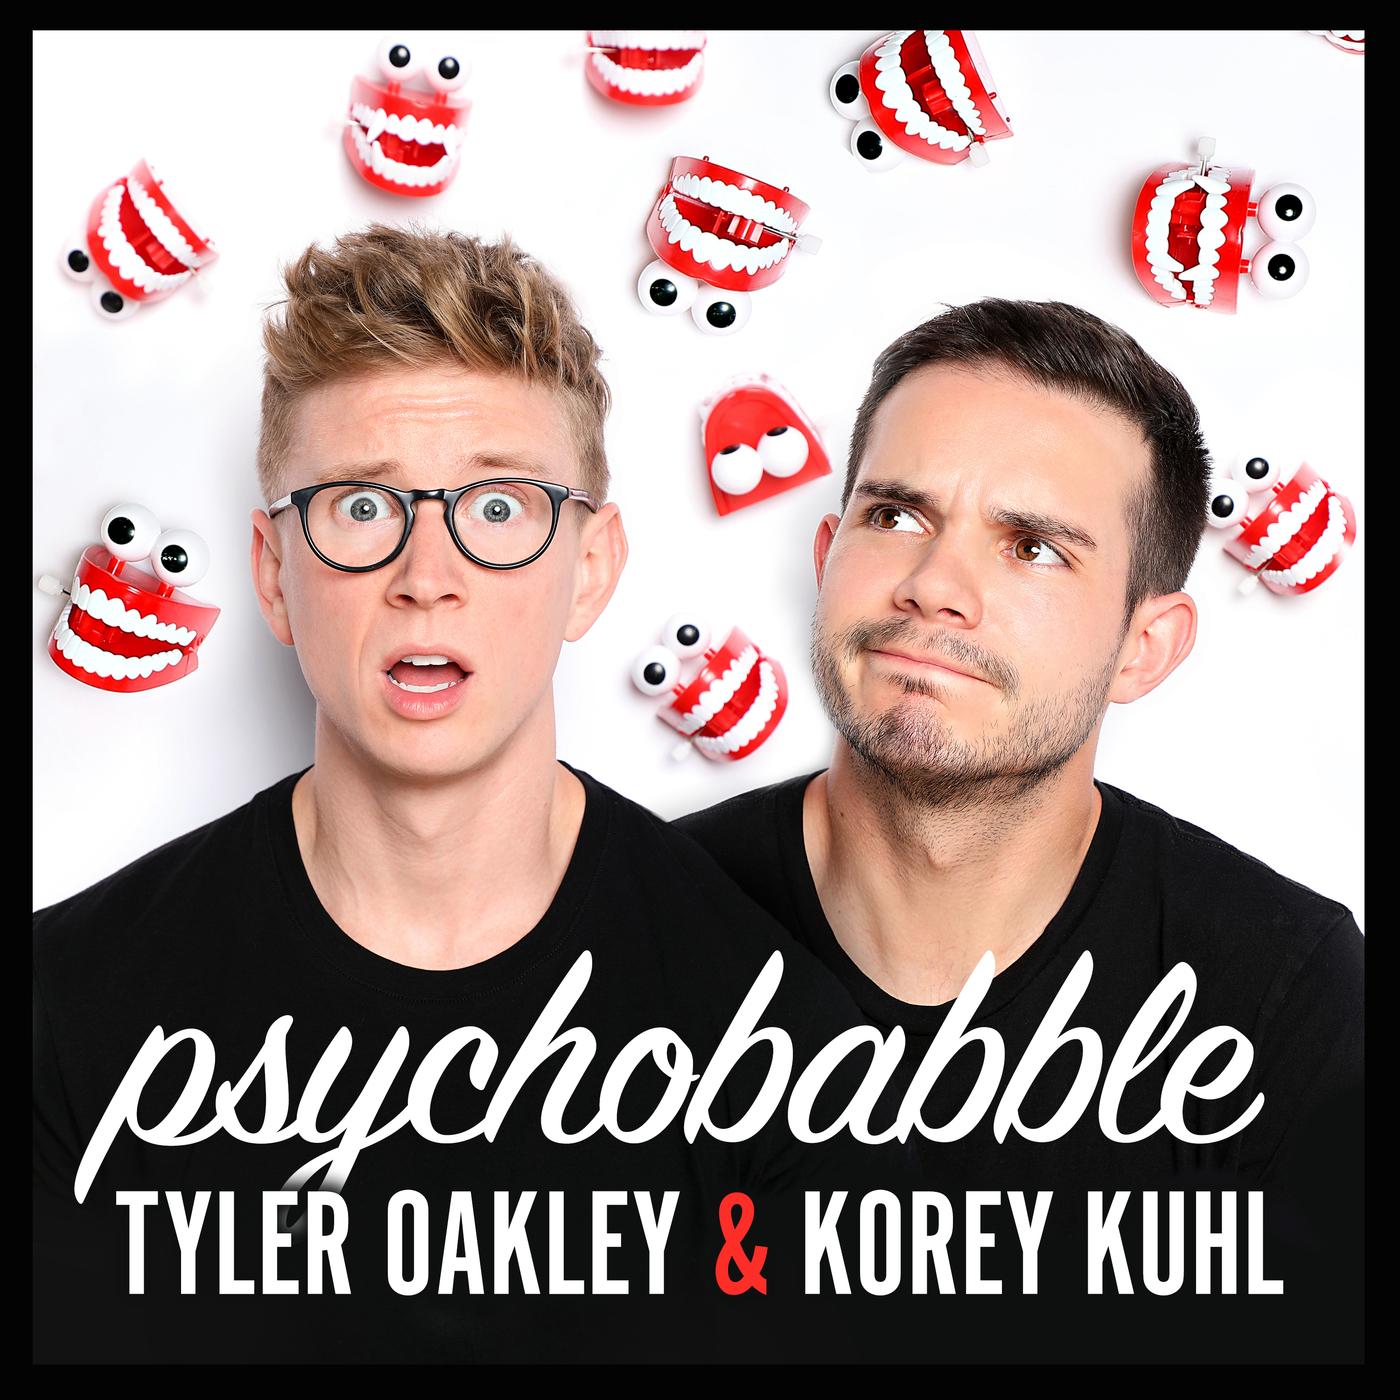 Psychobabble with Tyler Oakley & Korey Kuhl | Premium Podcast Leader